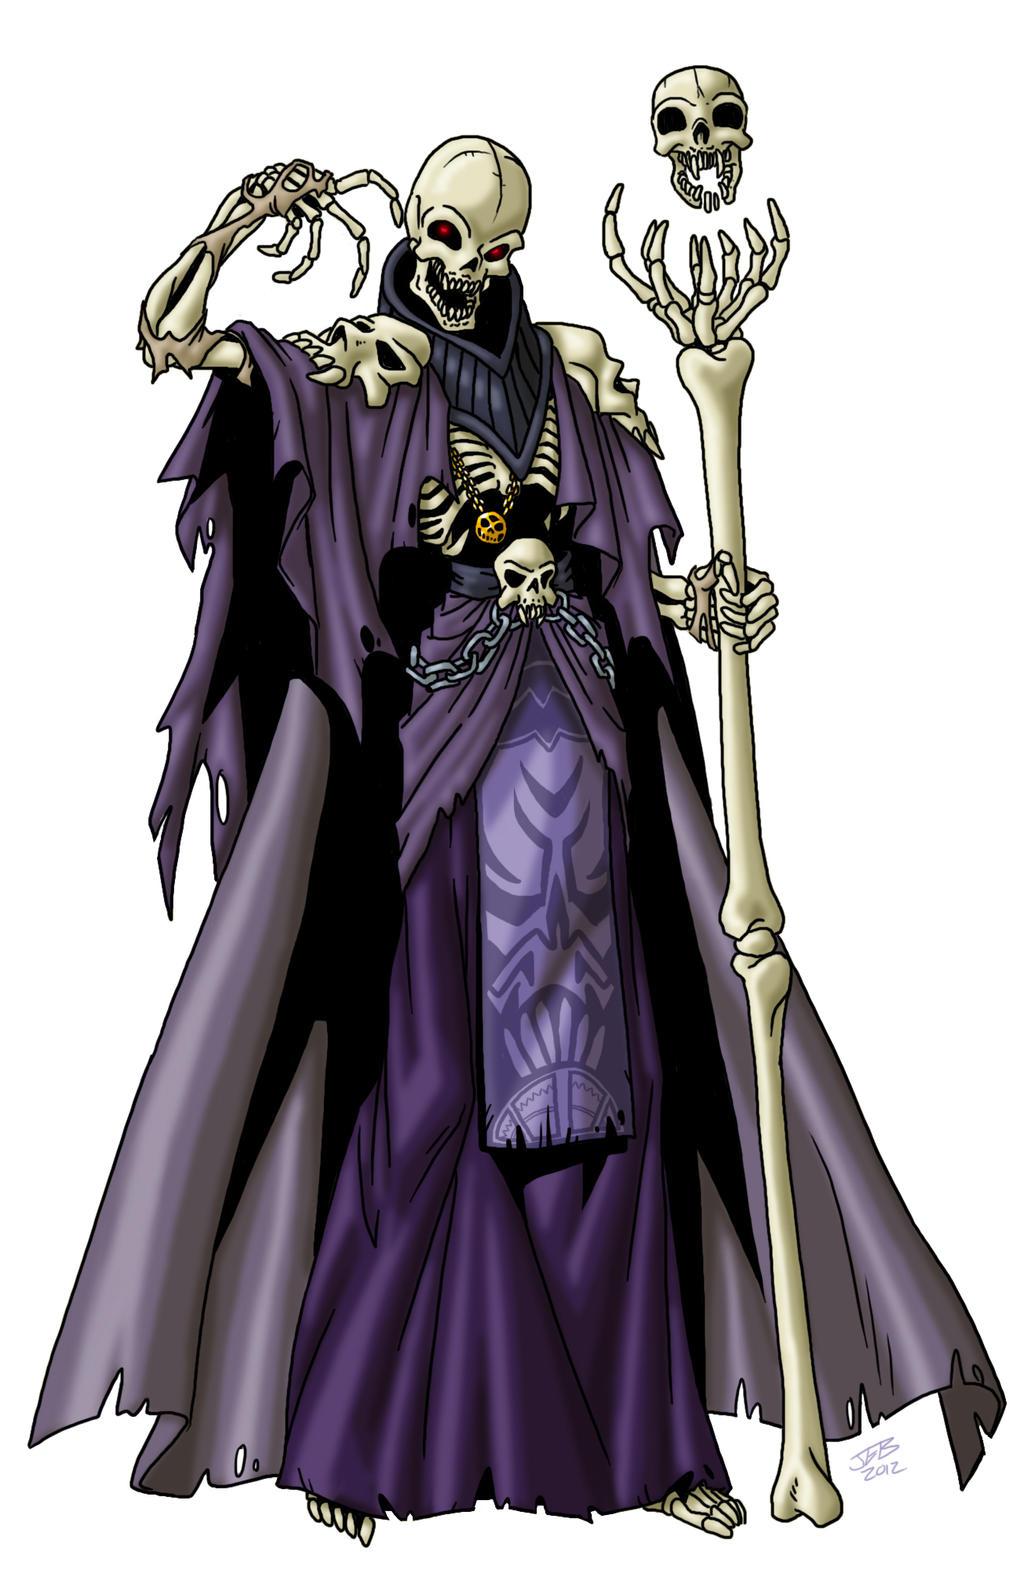 Art wraith king 6